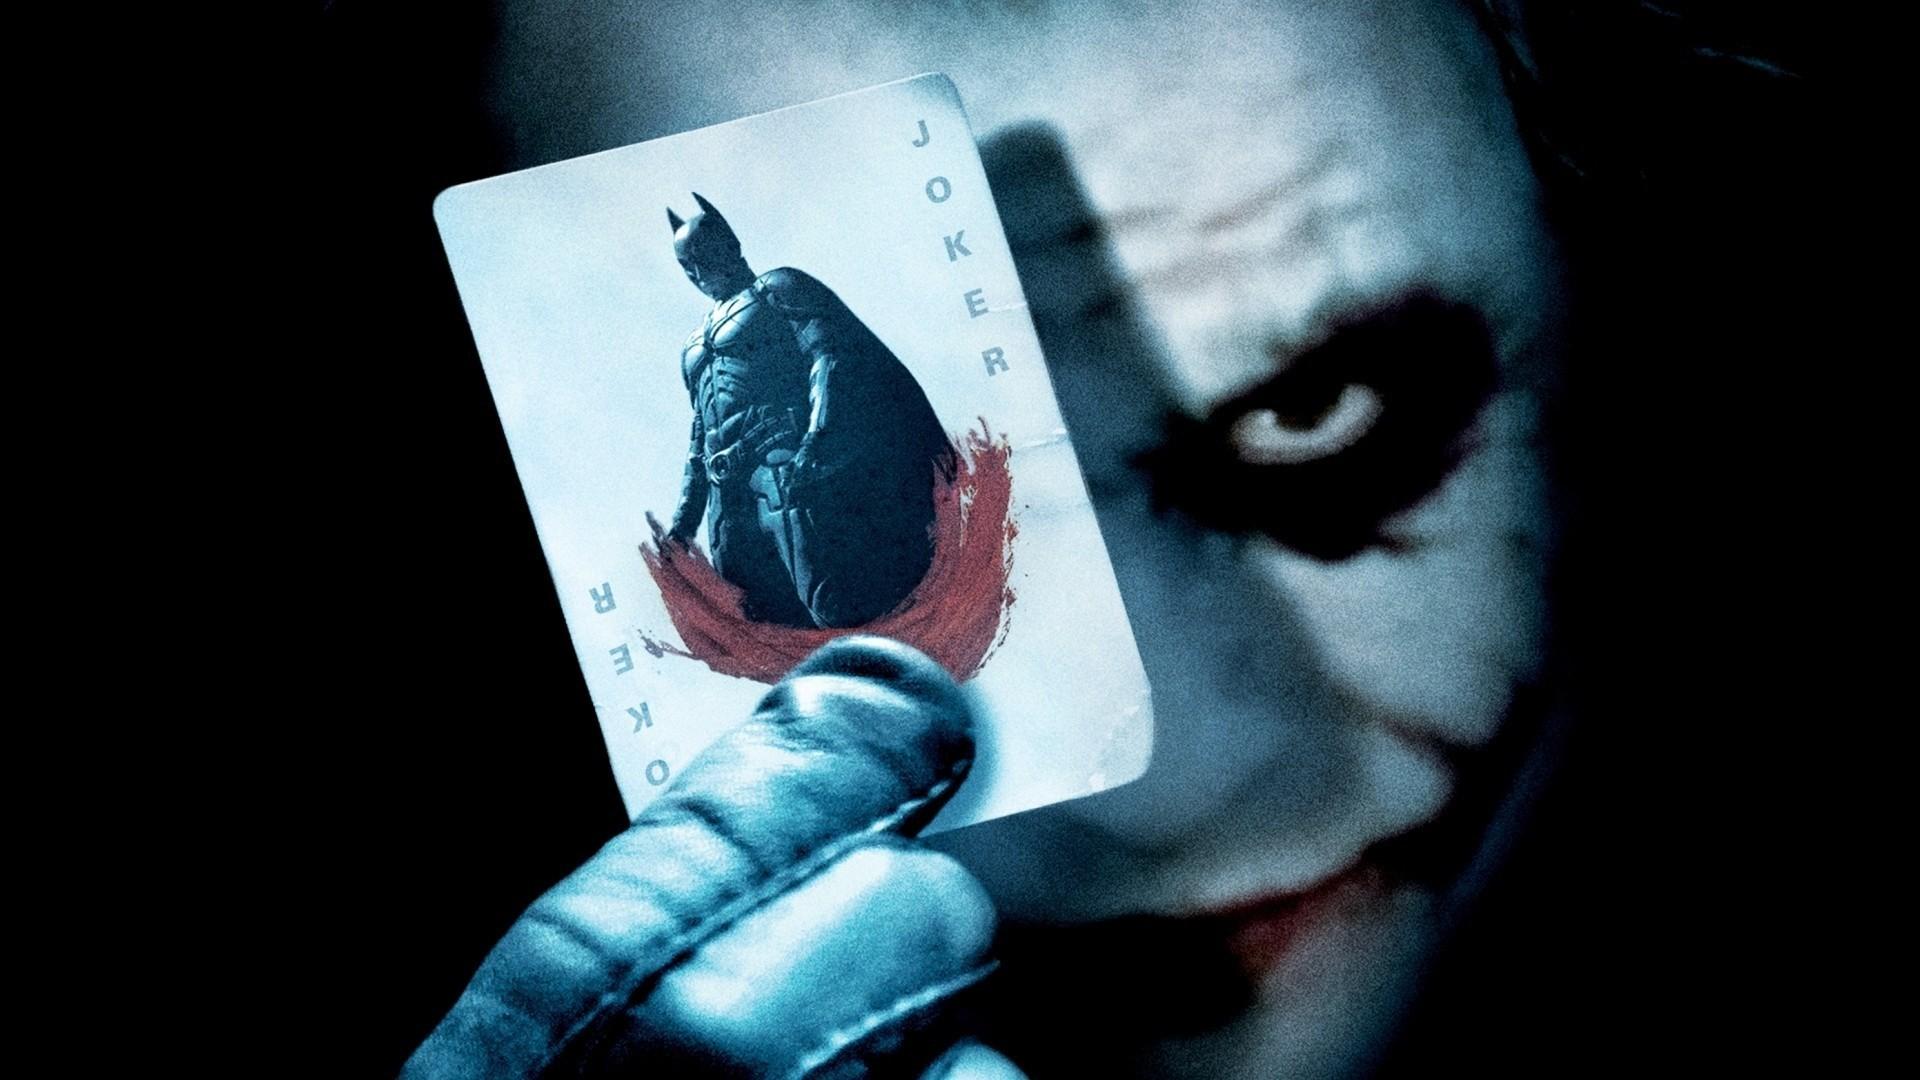 joker cards hd wallpapers …